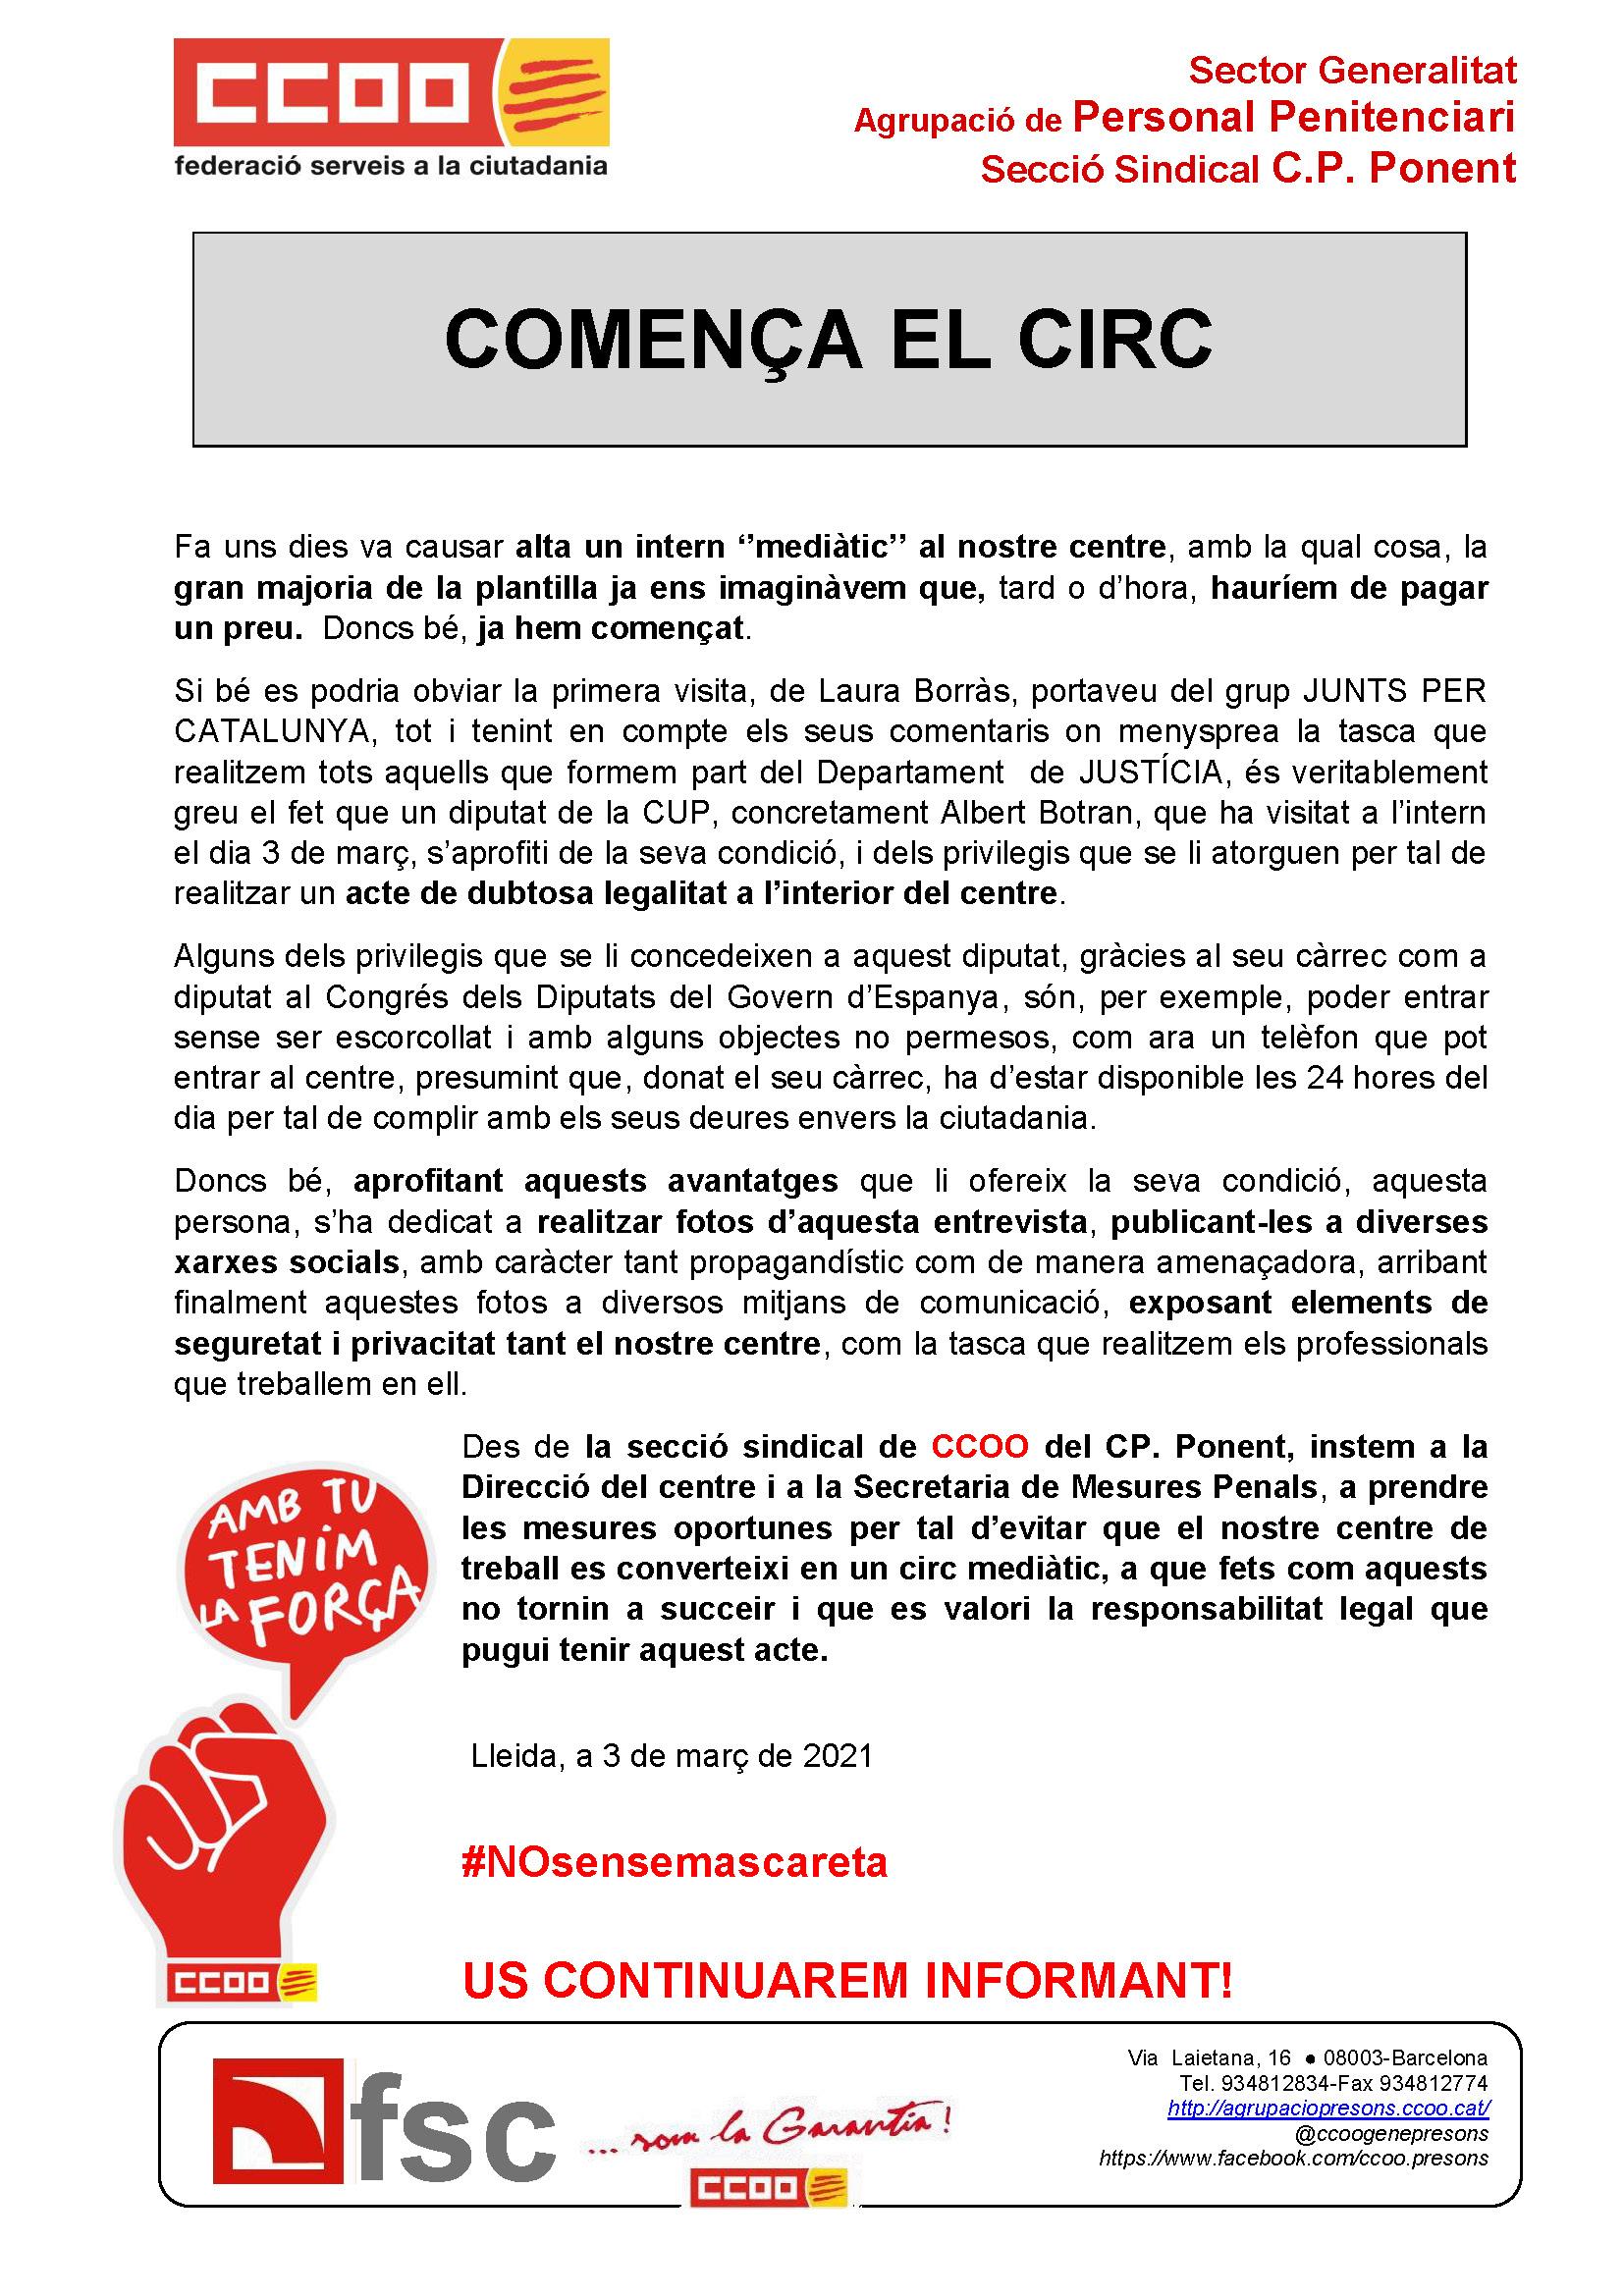 CP-Ponent-COMENCA-EL-CIRC